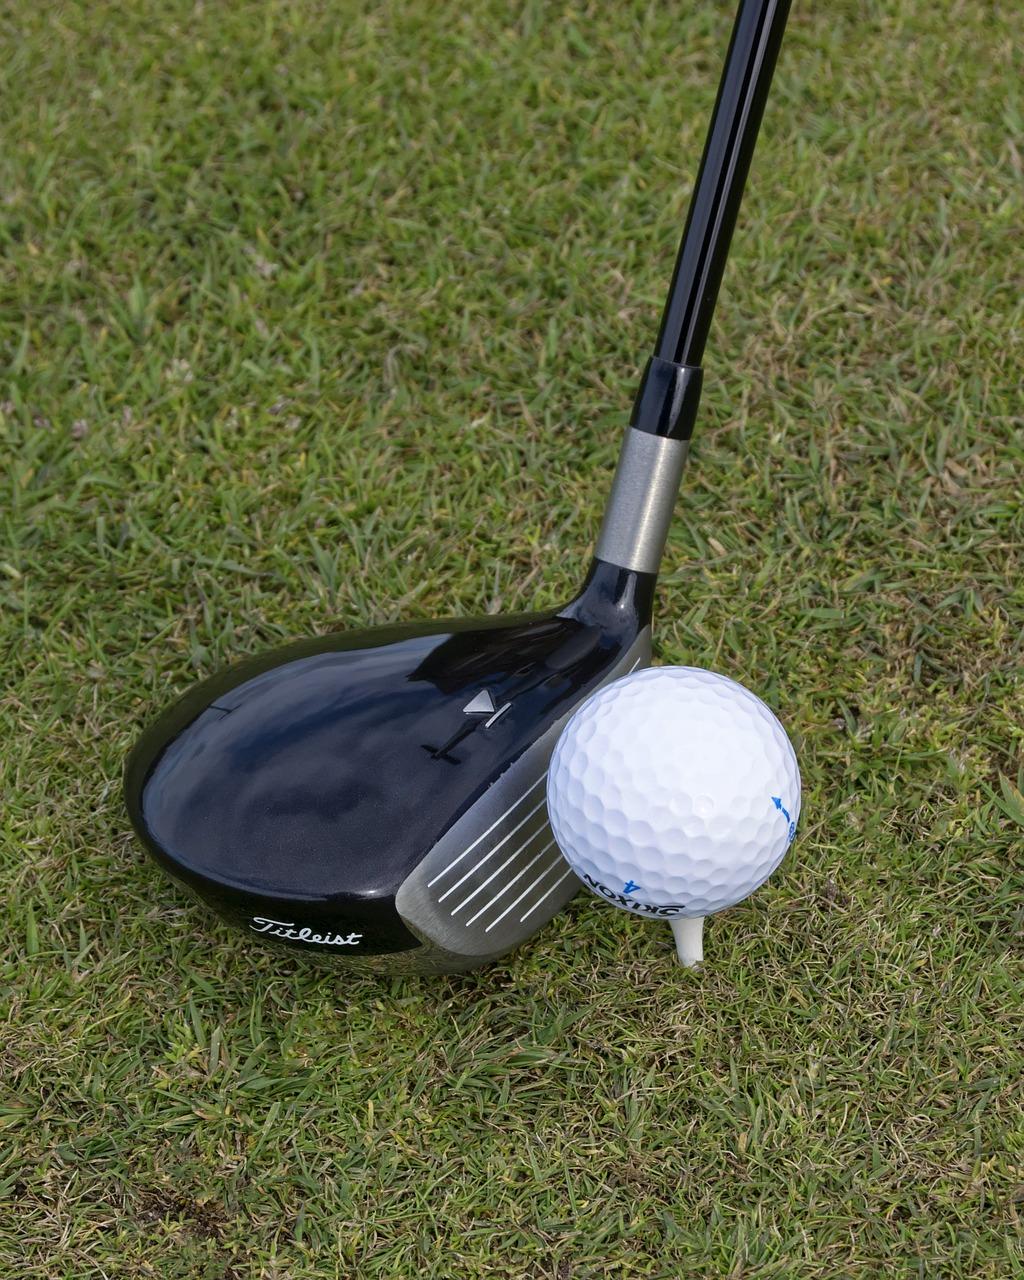 adelaide best golf courses royal club kooyonga blackwood glenelg higercombe country south australia cherry gardens championship amateur